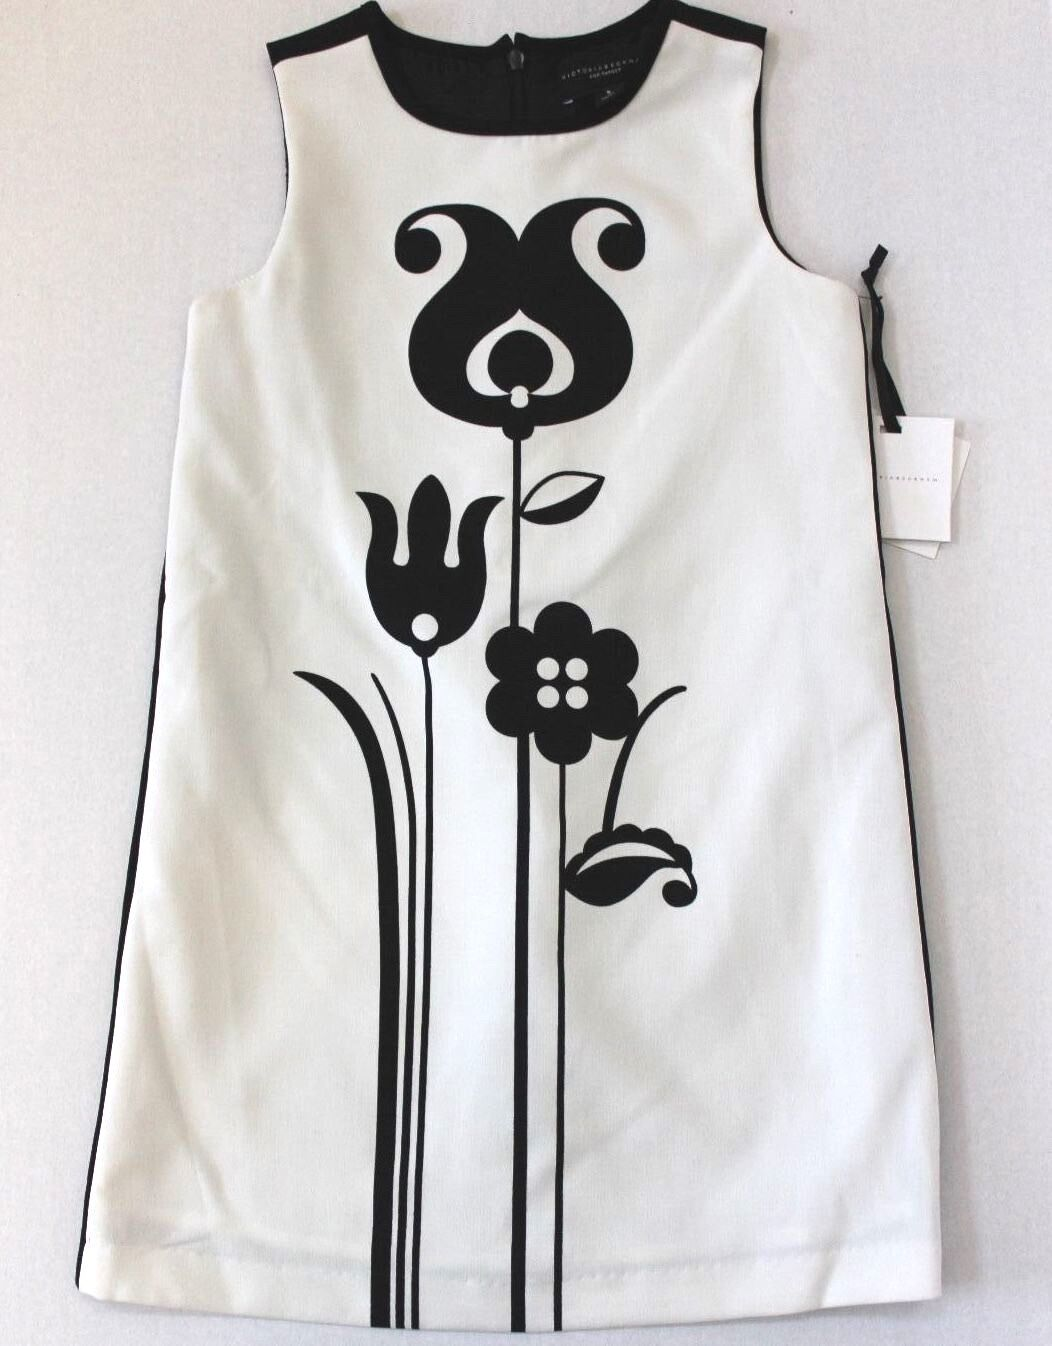 Victoria Beckham For Target Girls Black White Mod Shift Tulip Dress